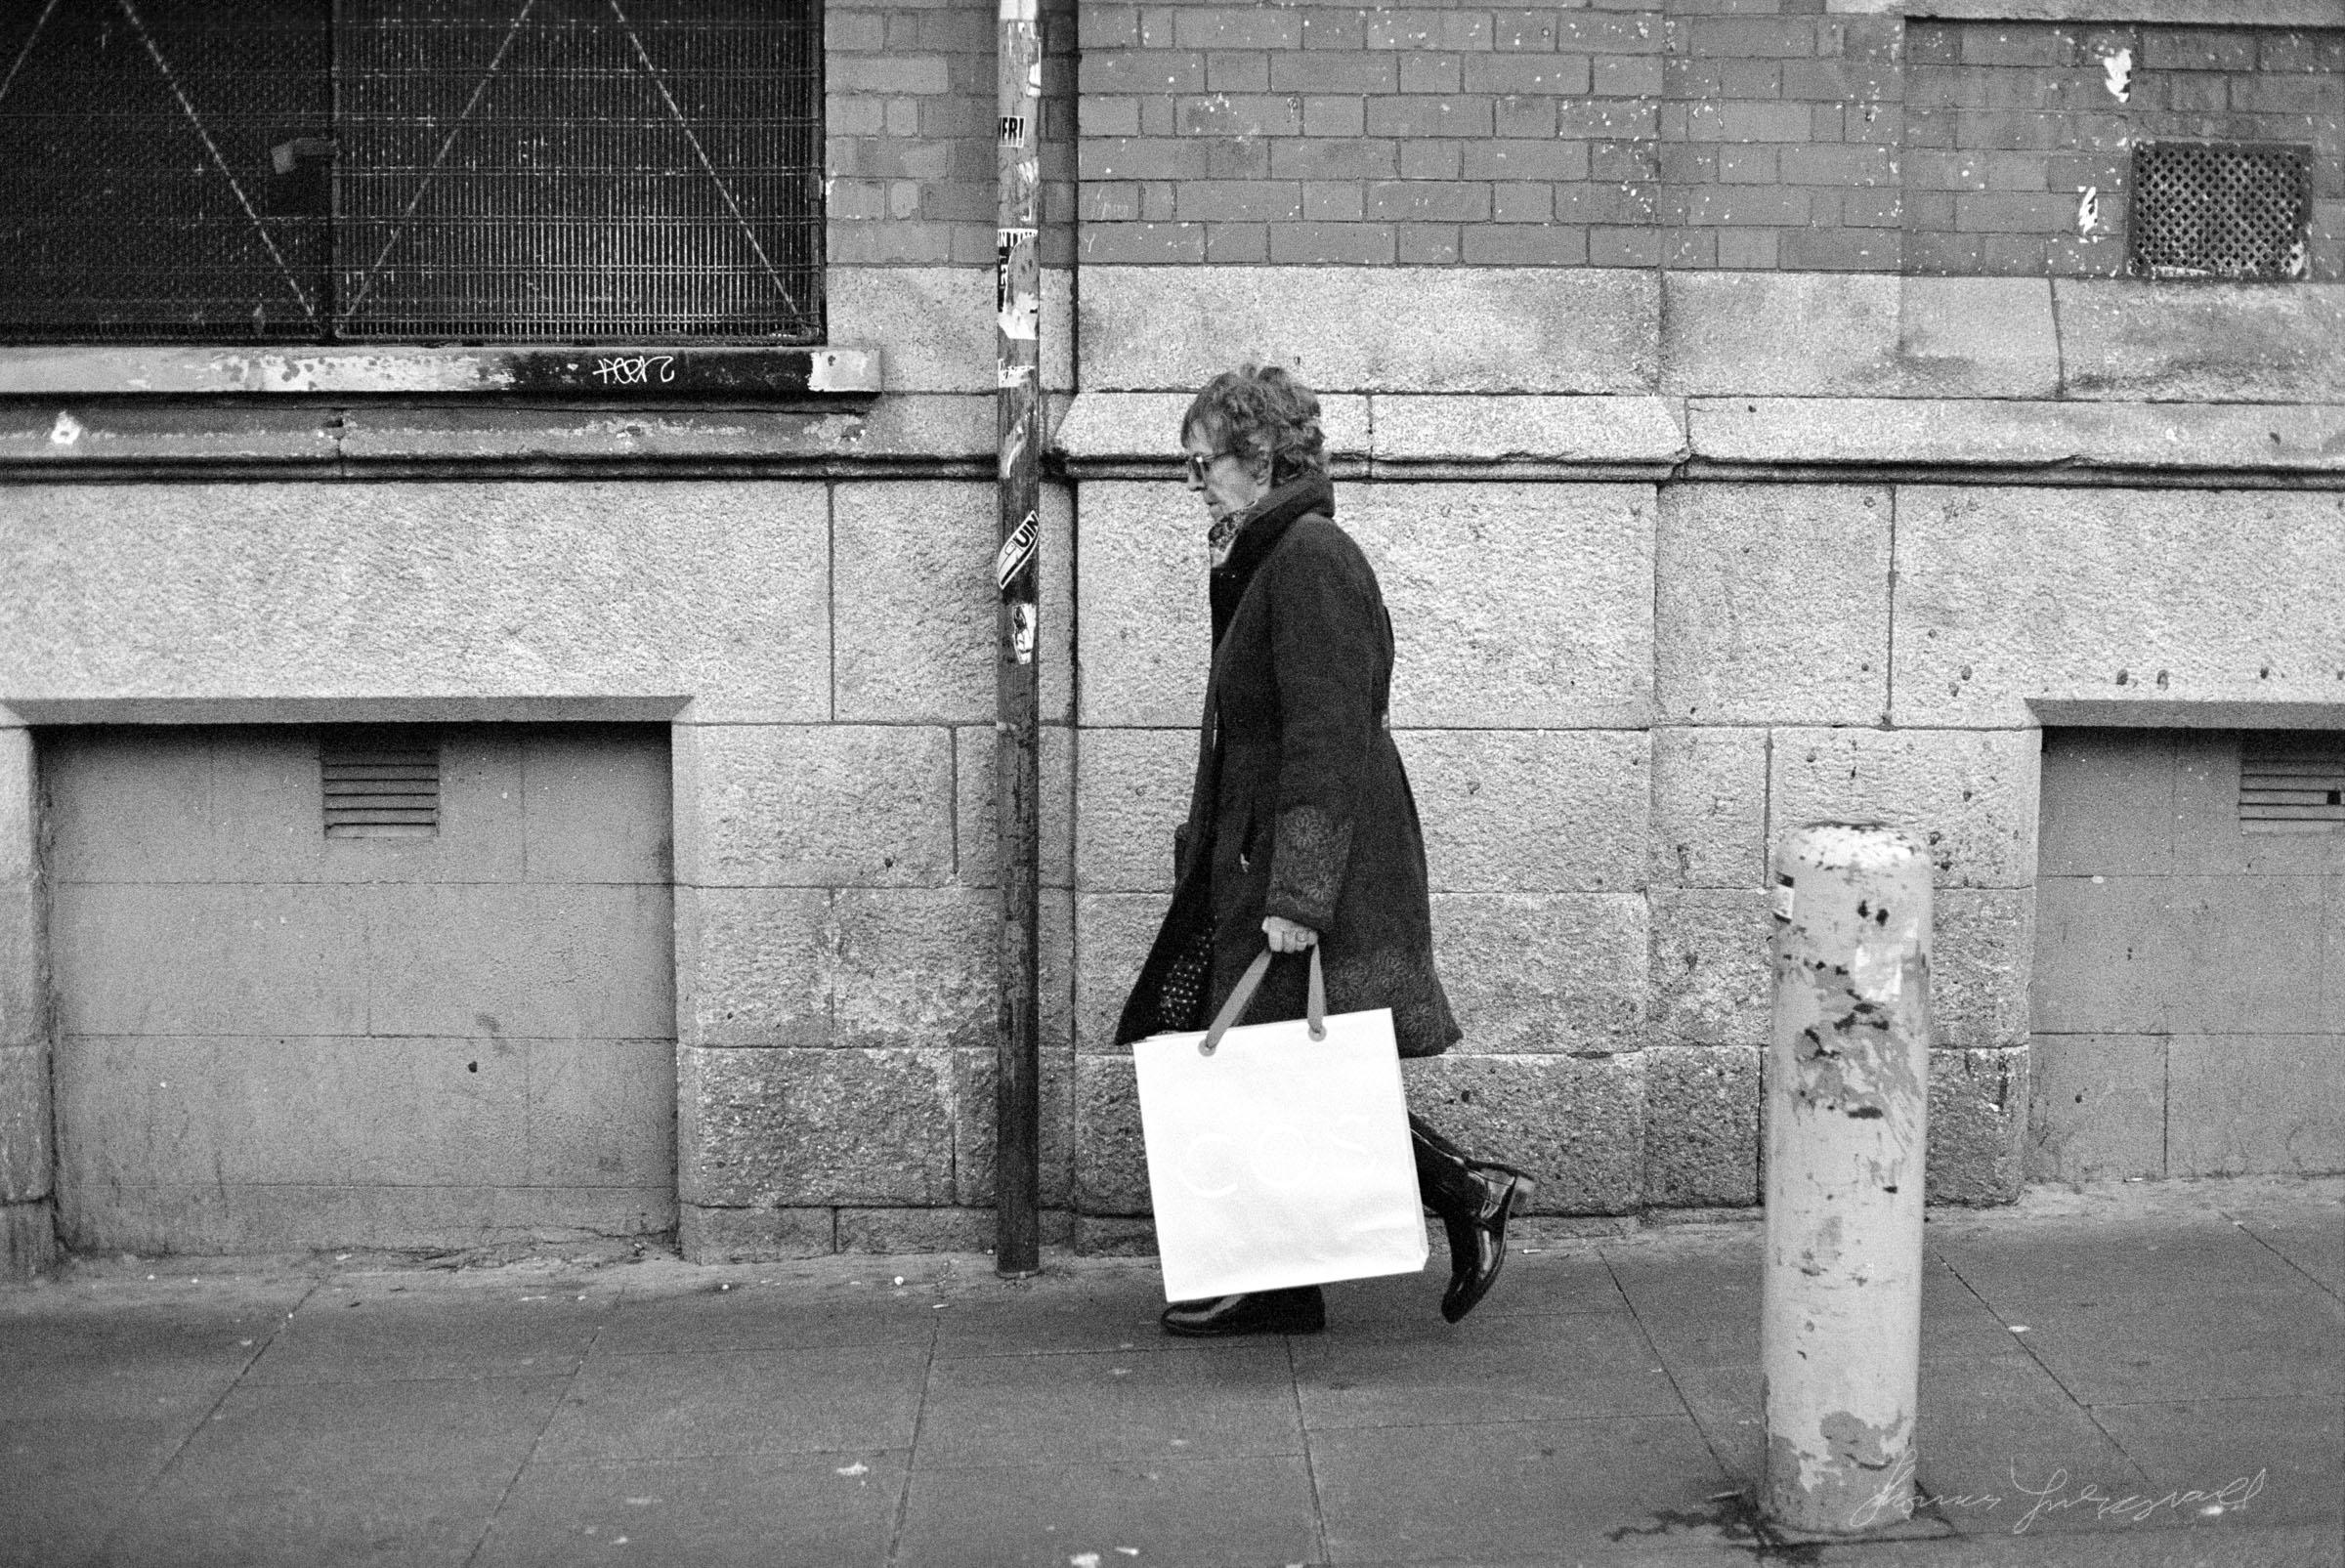 Woman walking through Temple Bar - Dublin on Film - The Streets of Dublin